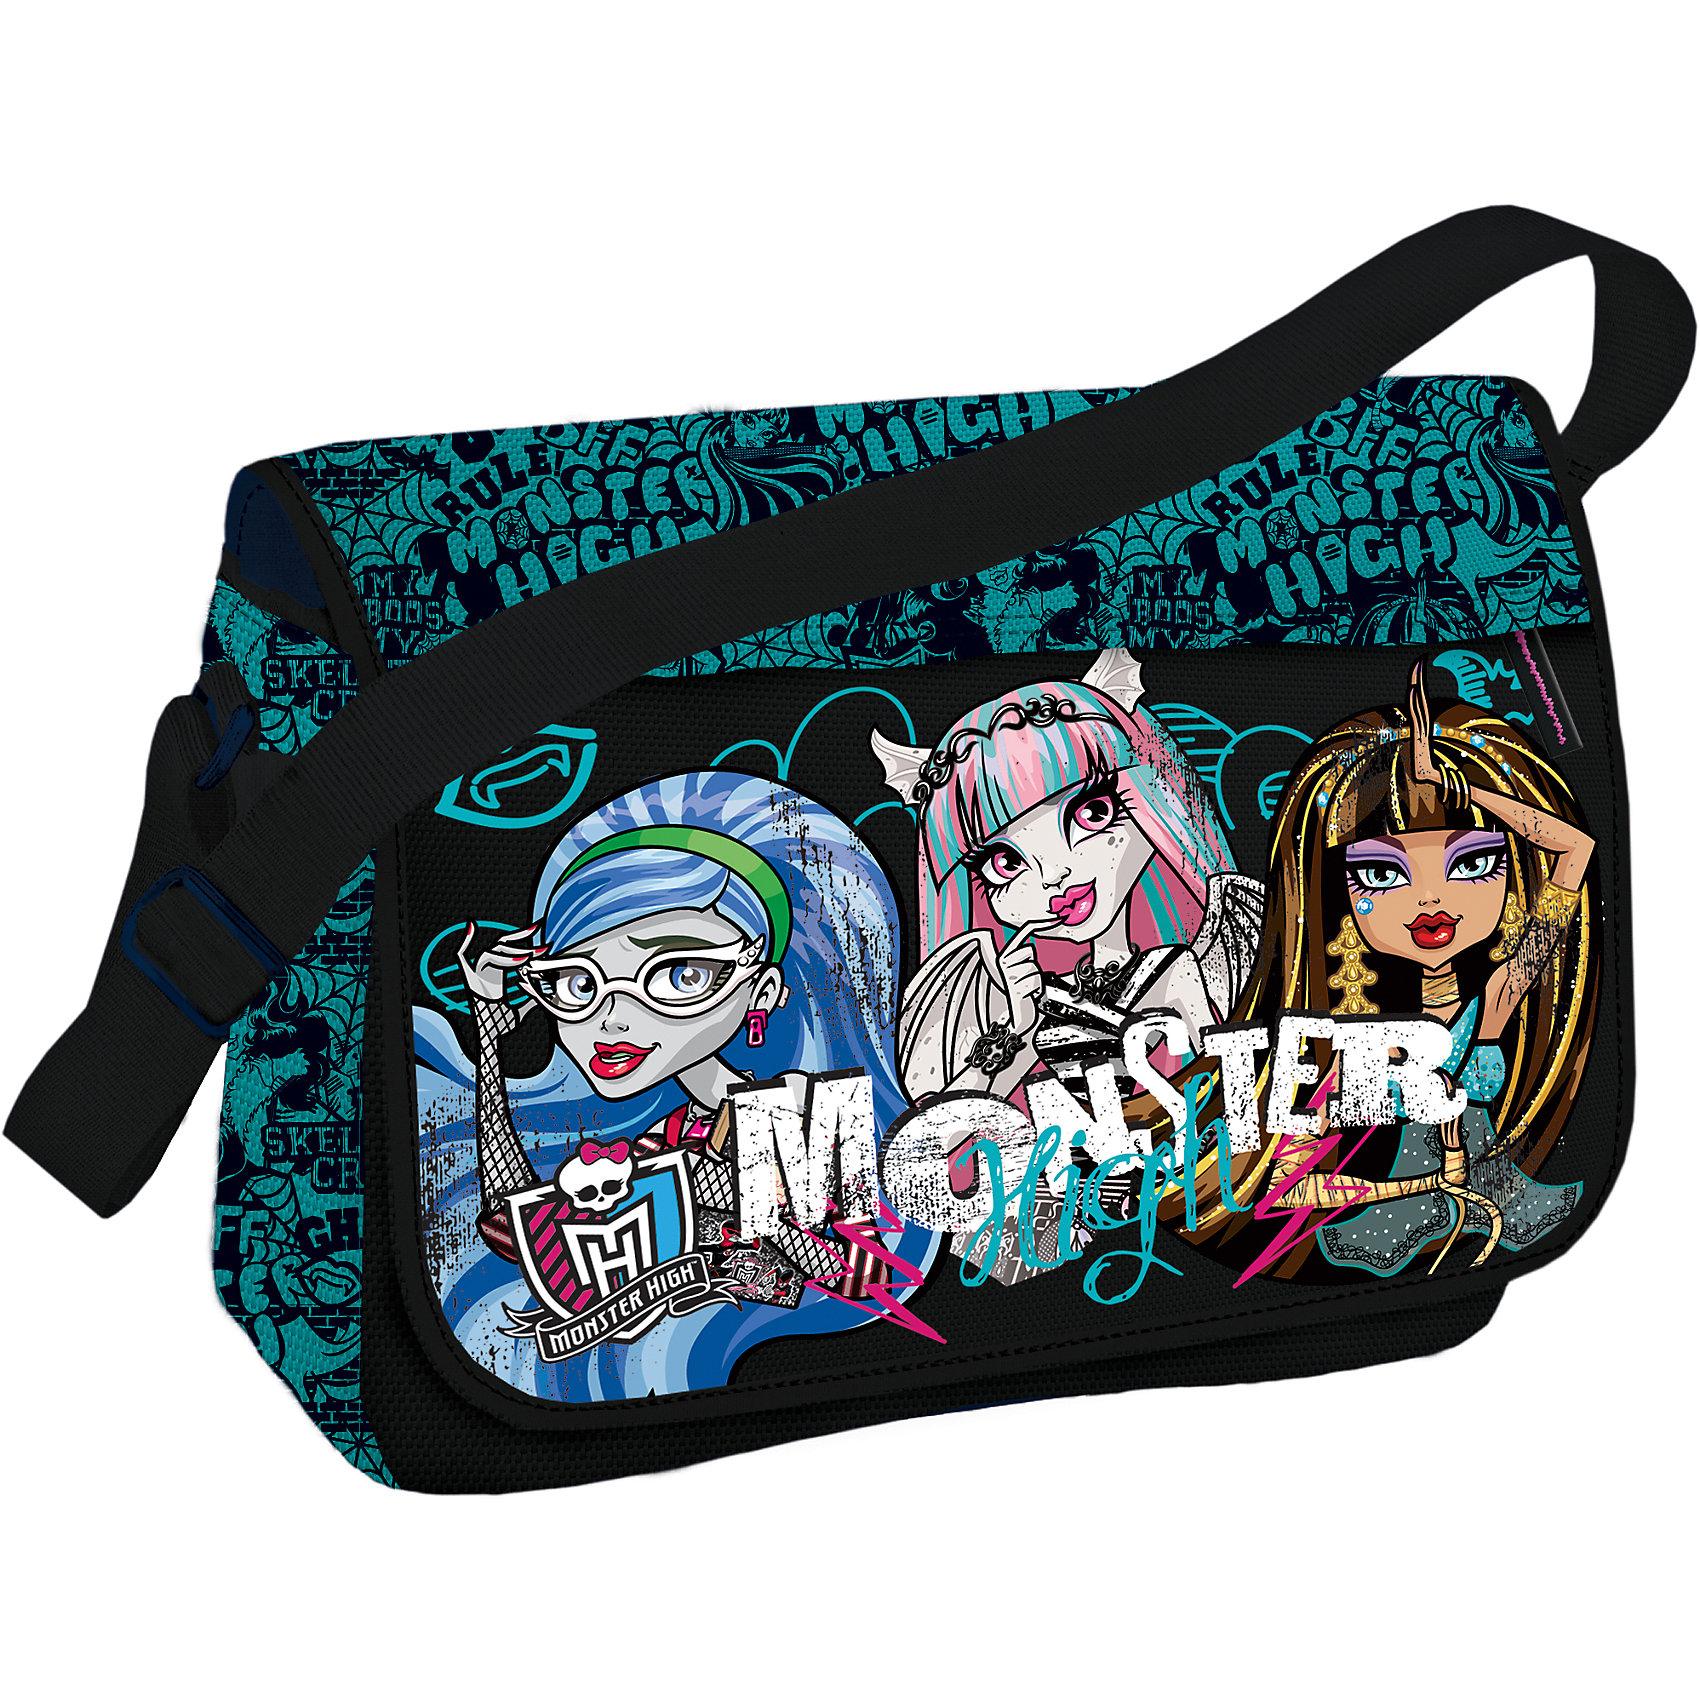 Академия групп Сумка, Monster High академия групп подарочный набор с пеналом monster high